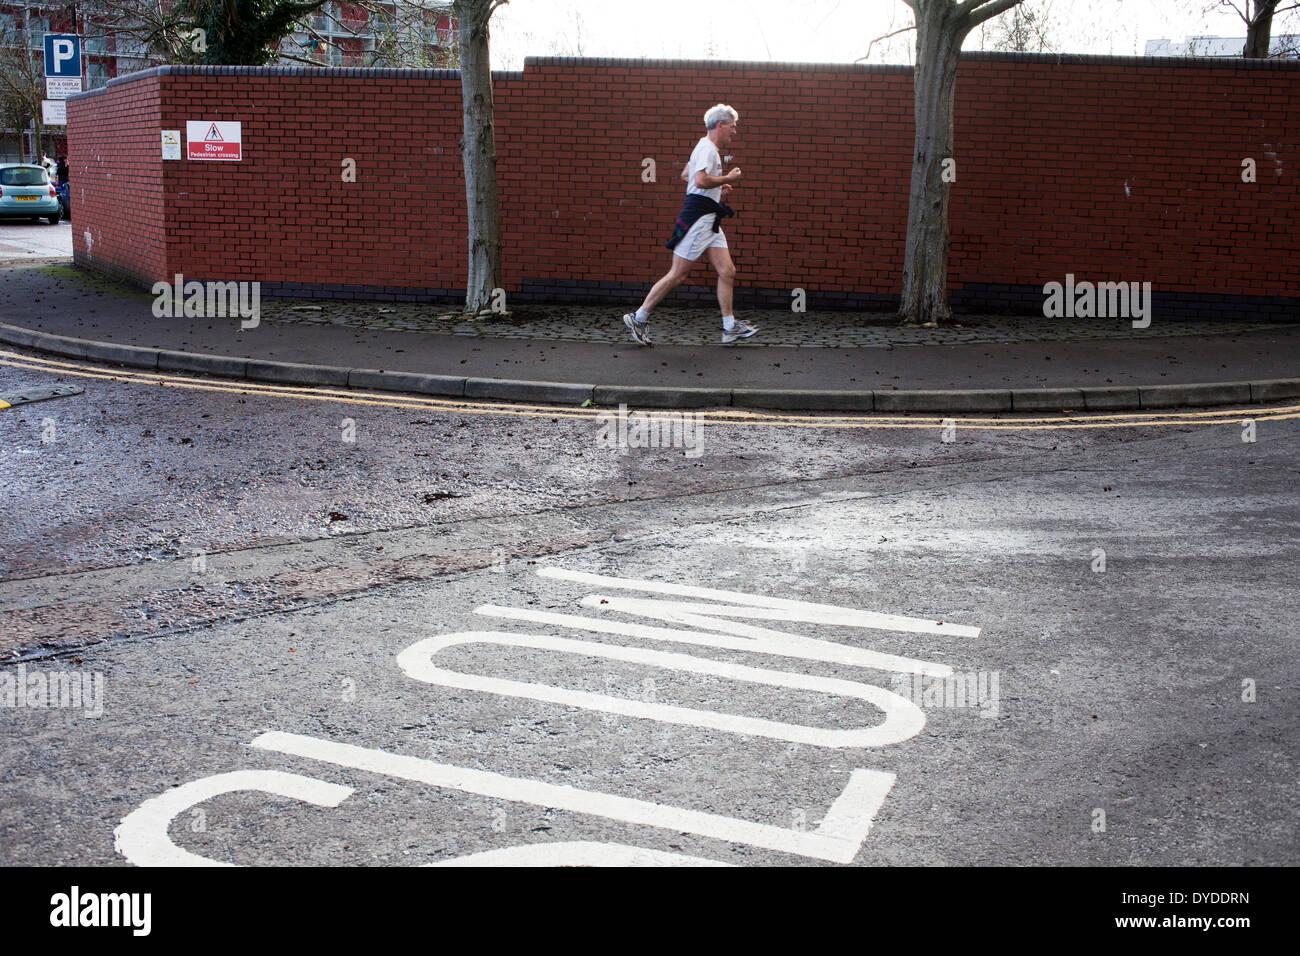 Man jogging in Harbourside. - Stock Image